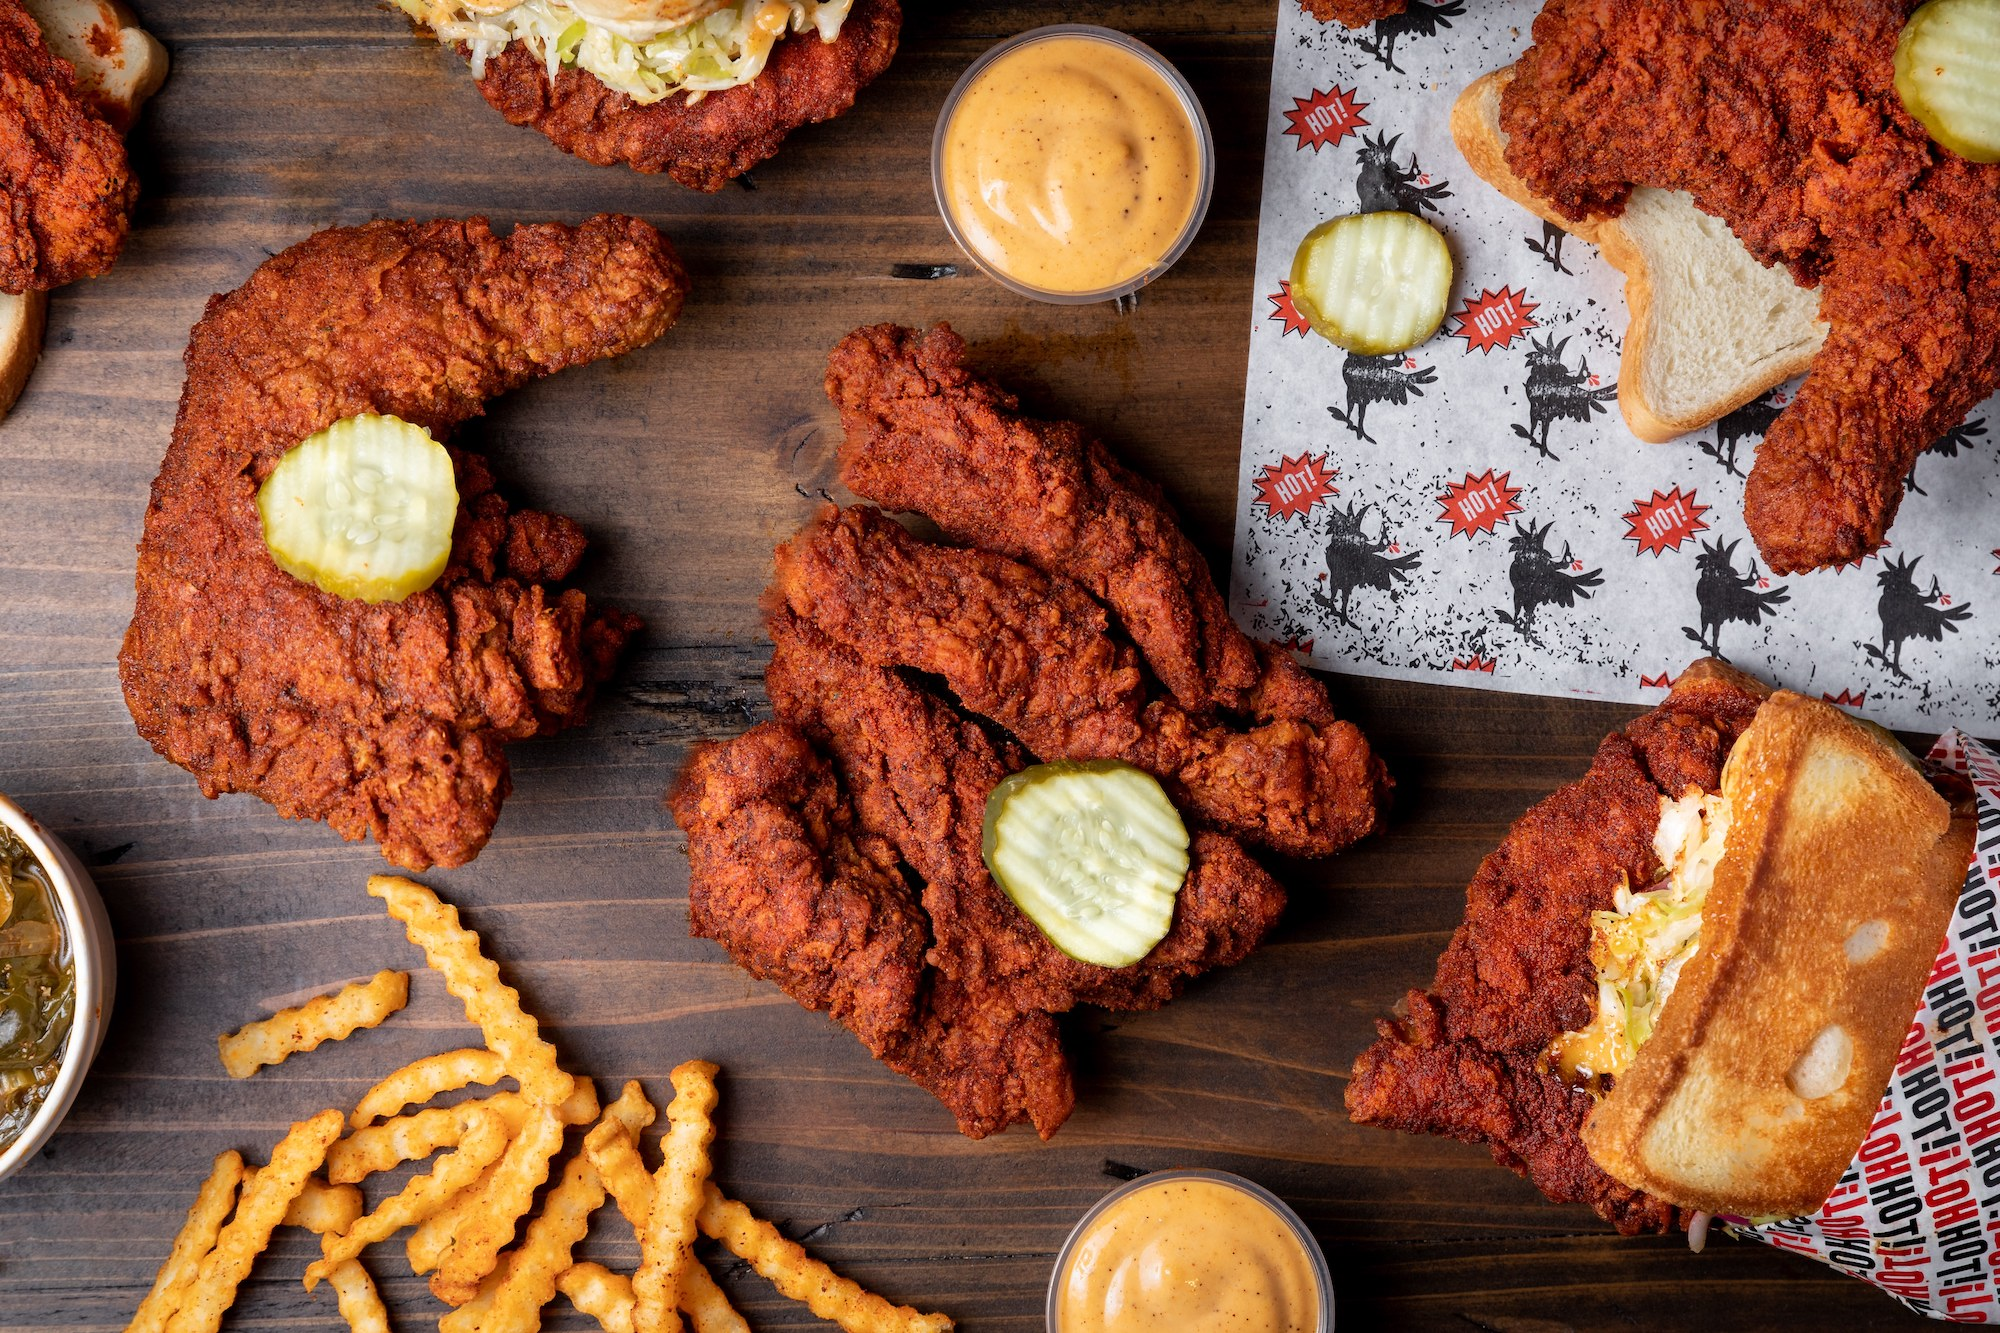 Hot Chicken Mega-Hit Howlin' Ray's Is Opening a Restaurant in Pasadena